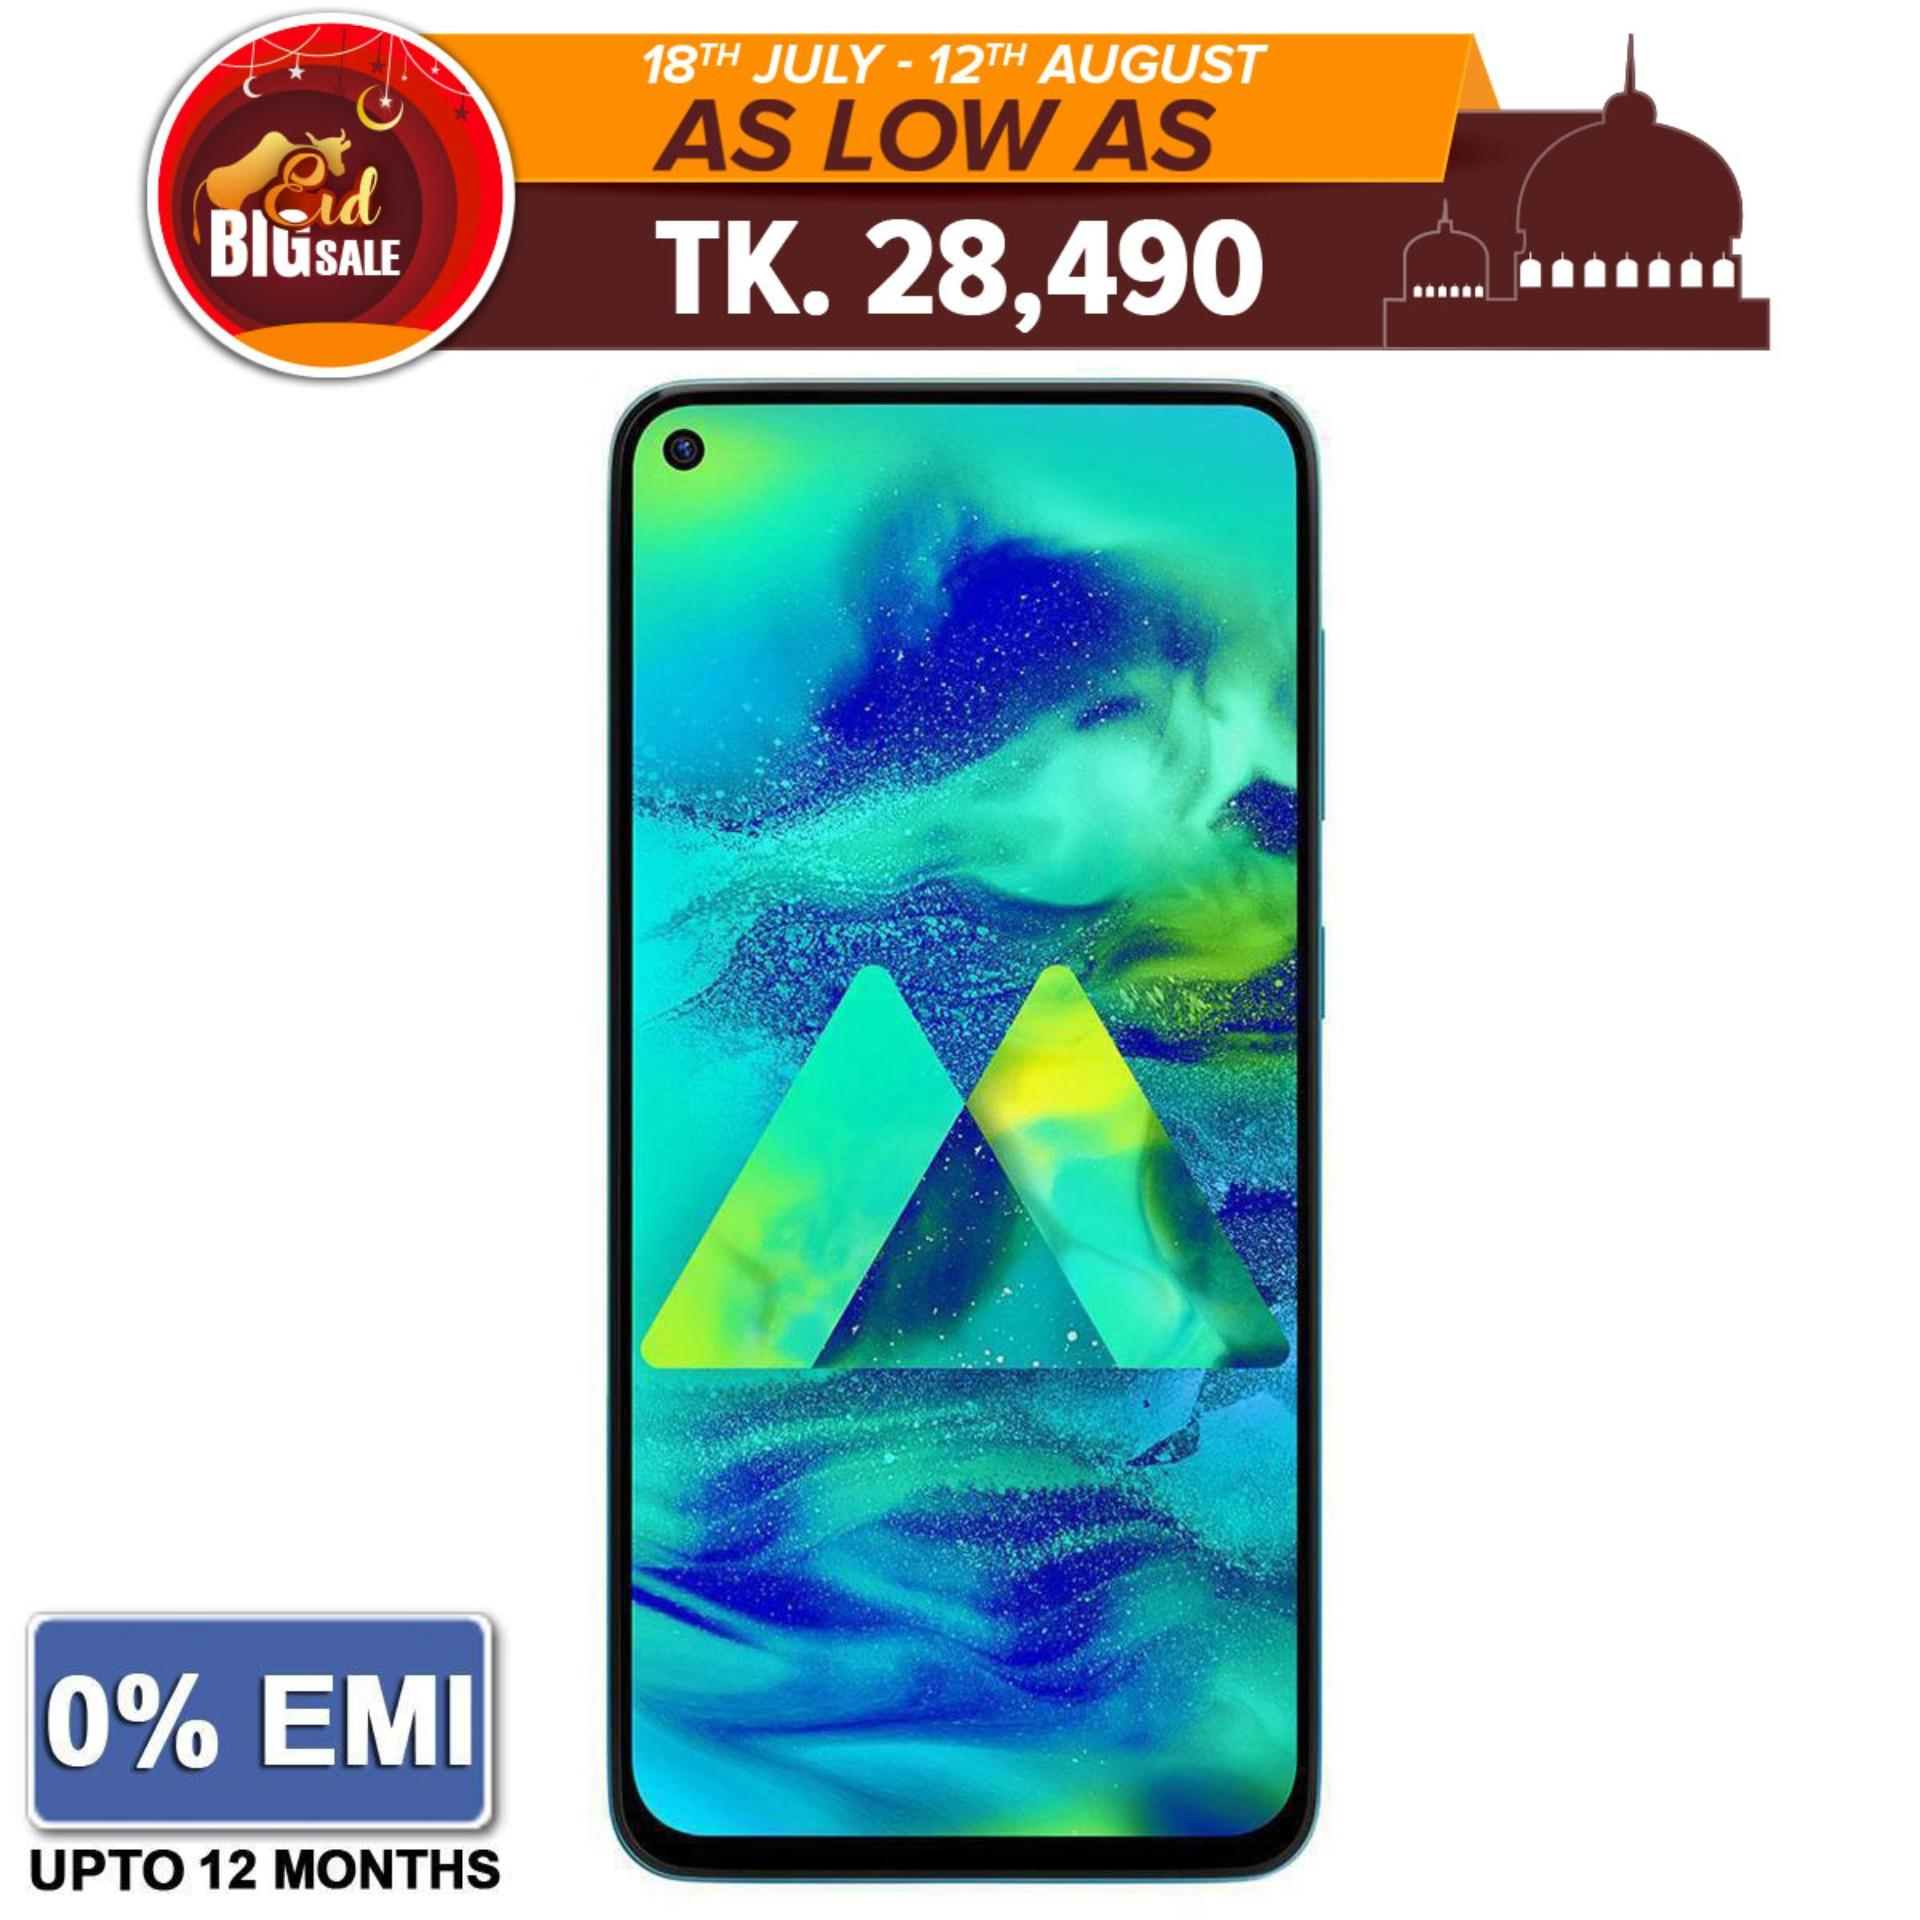 Samsung Mobile Phone In Bangladesh At Best Price - Daraz com bd